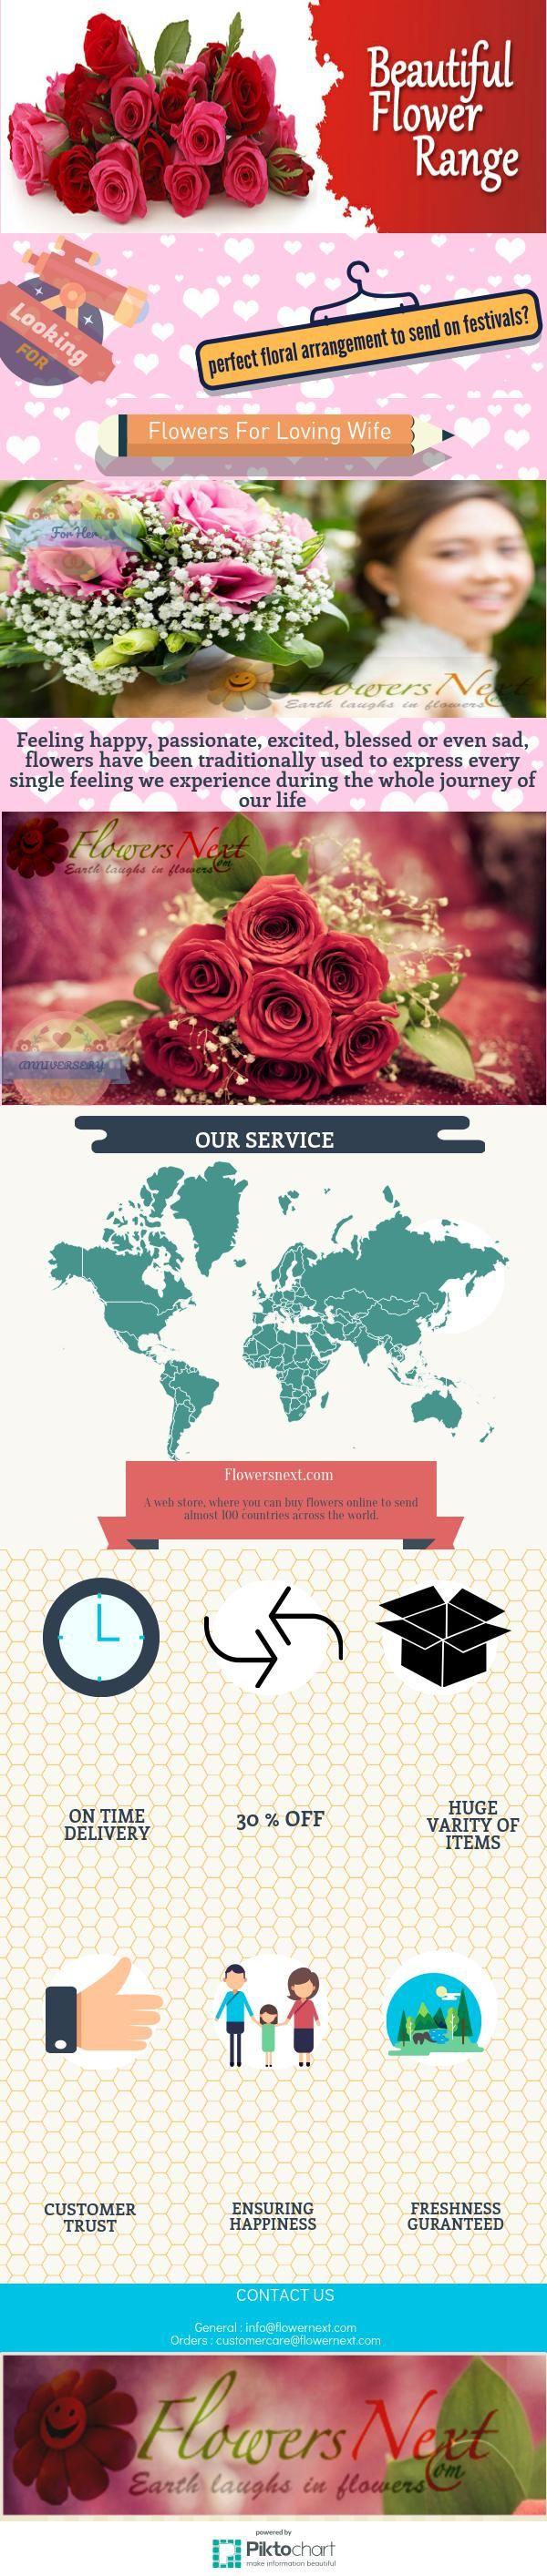 Online Flower Delivery | @Piktochart Infographic